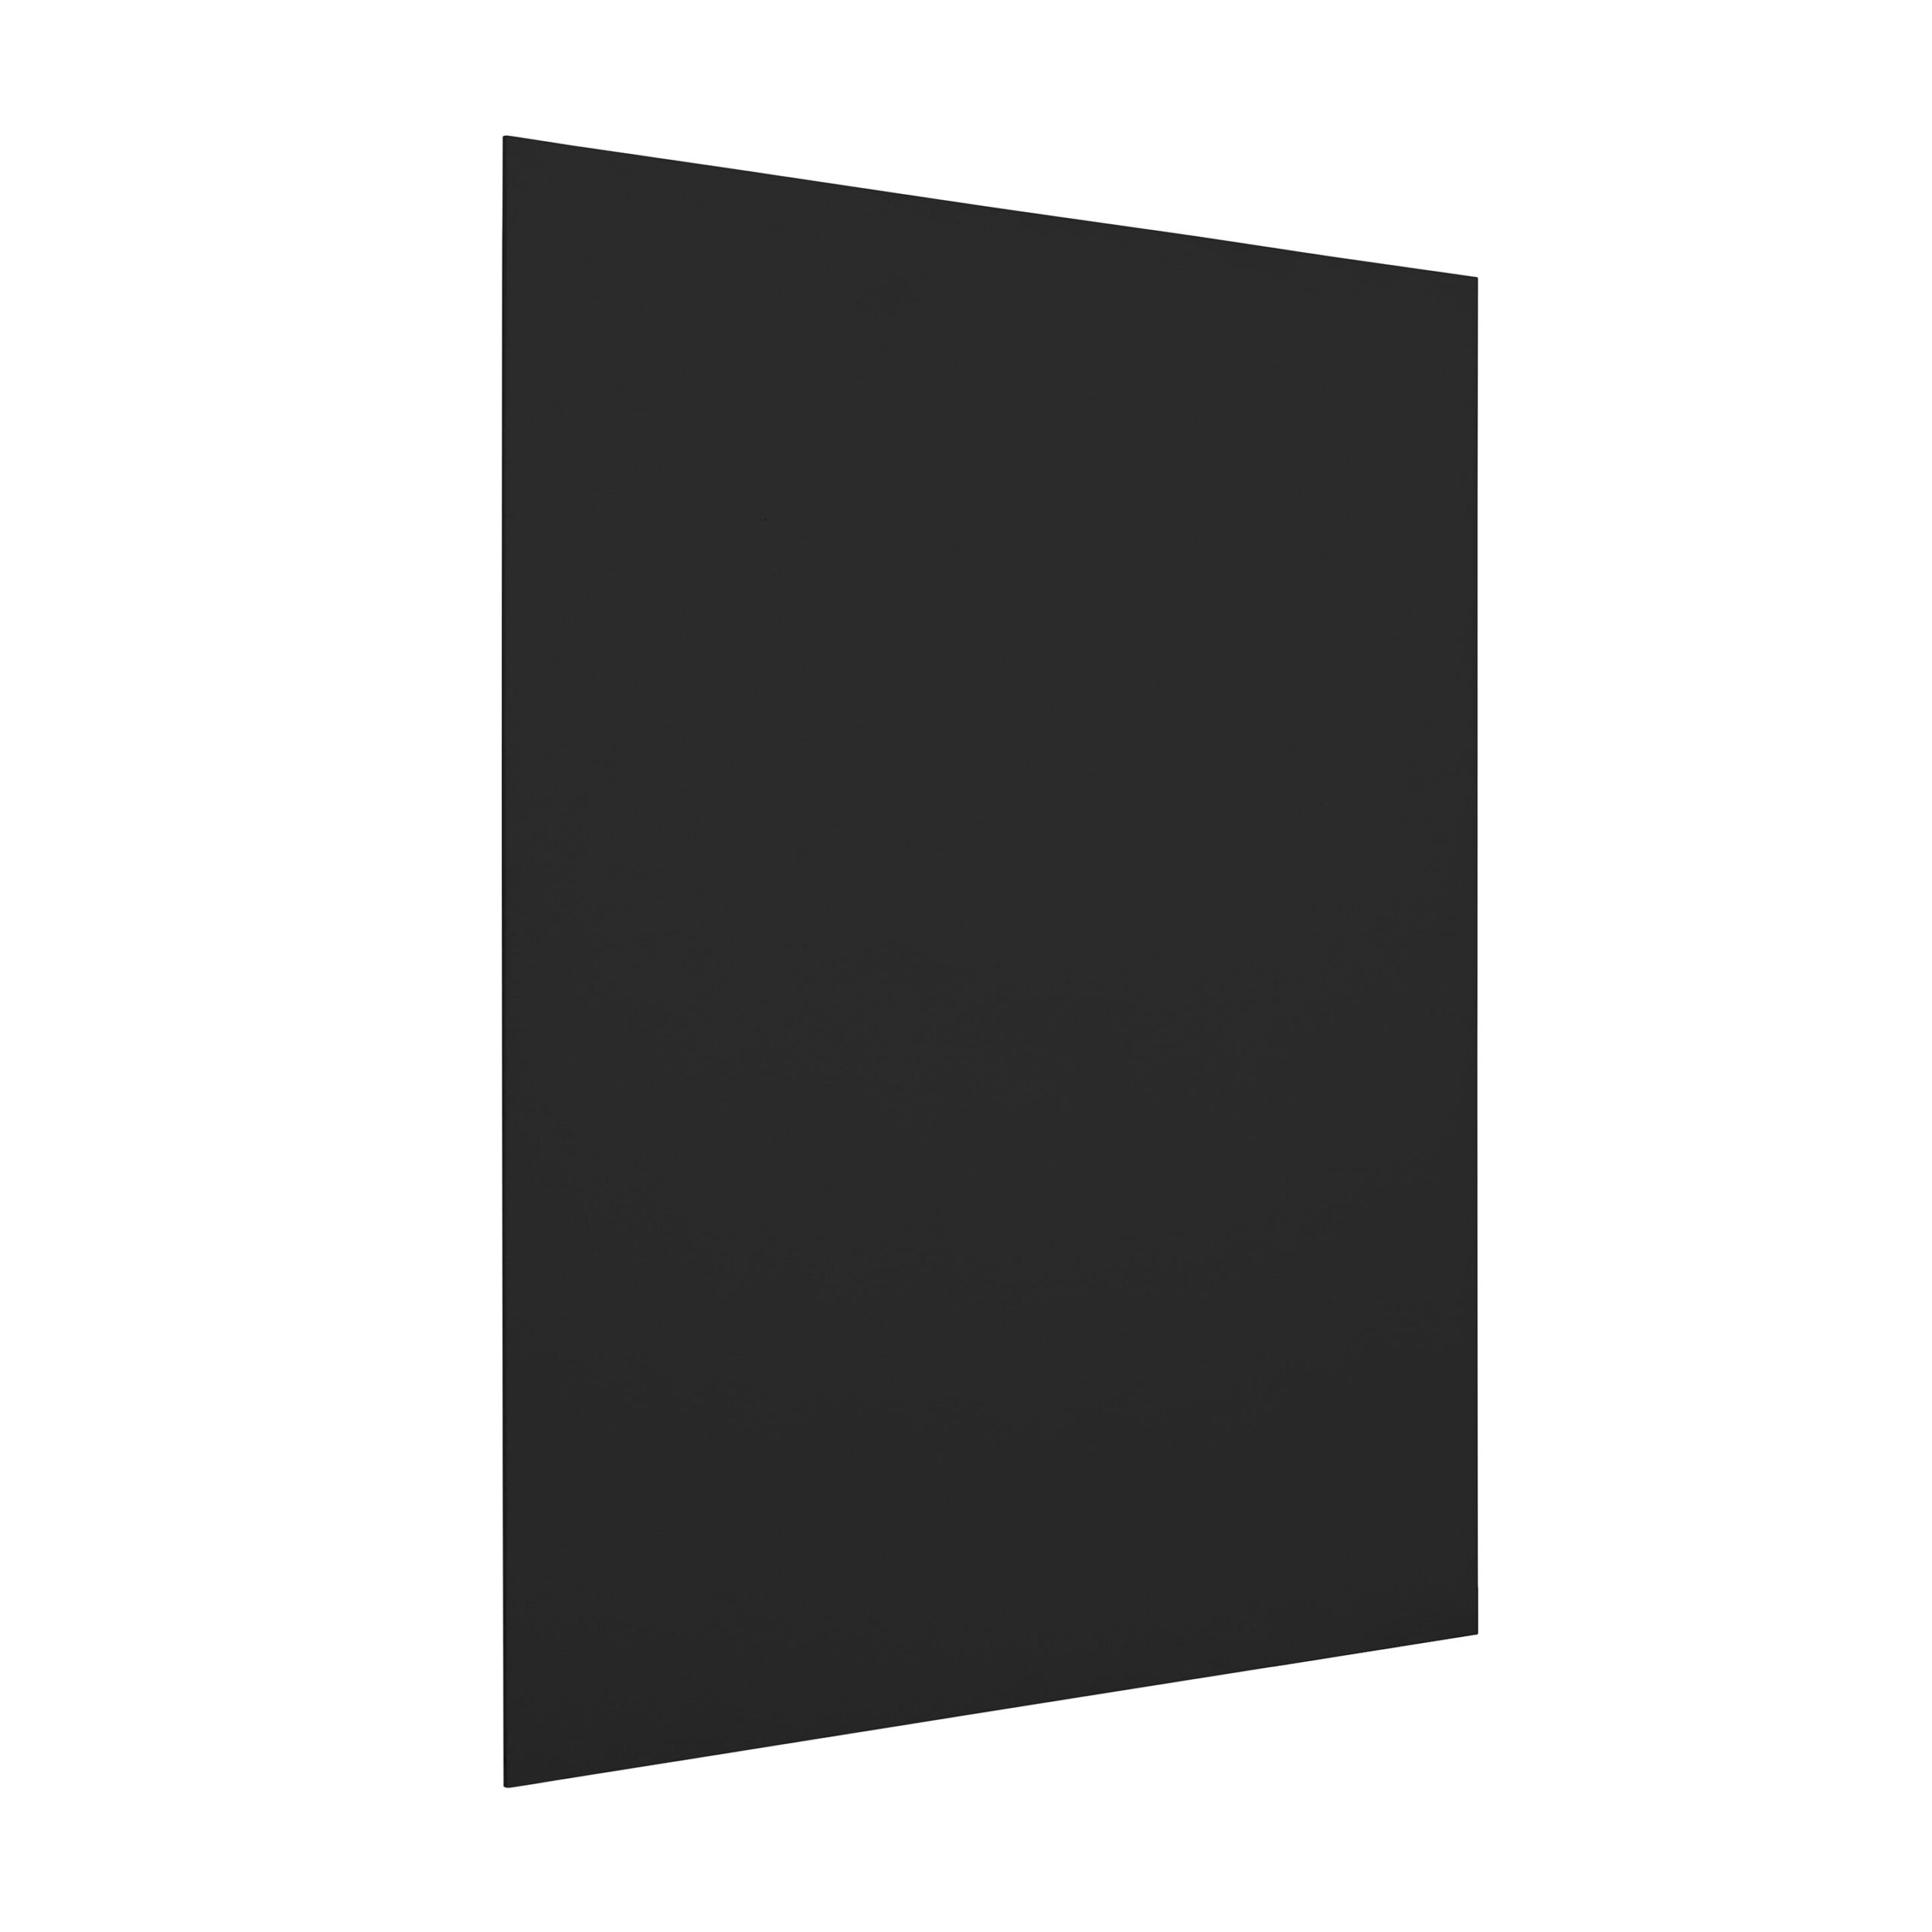 Space-Bulletin-Board_08